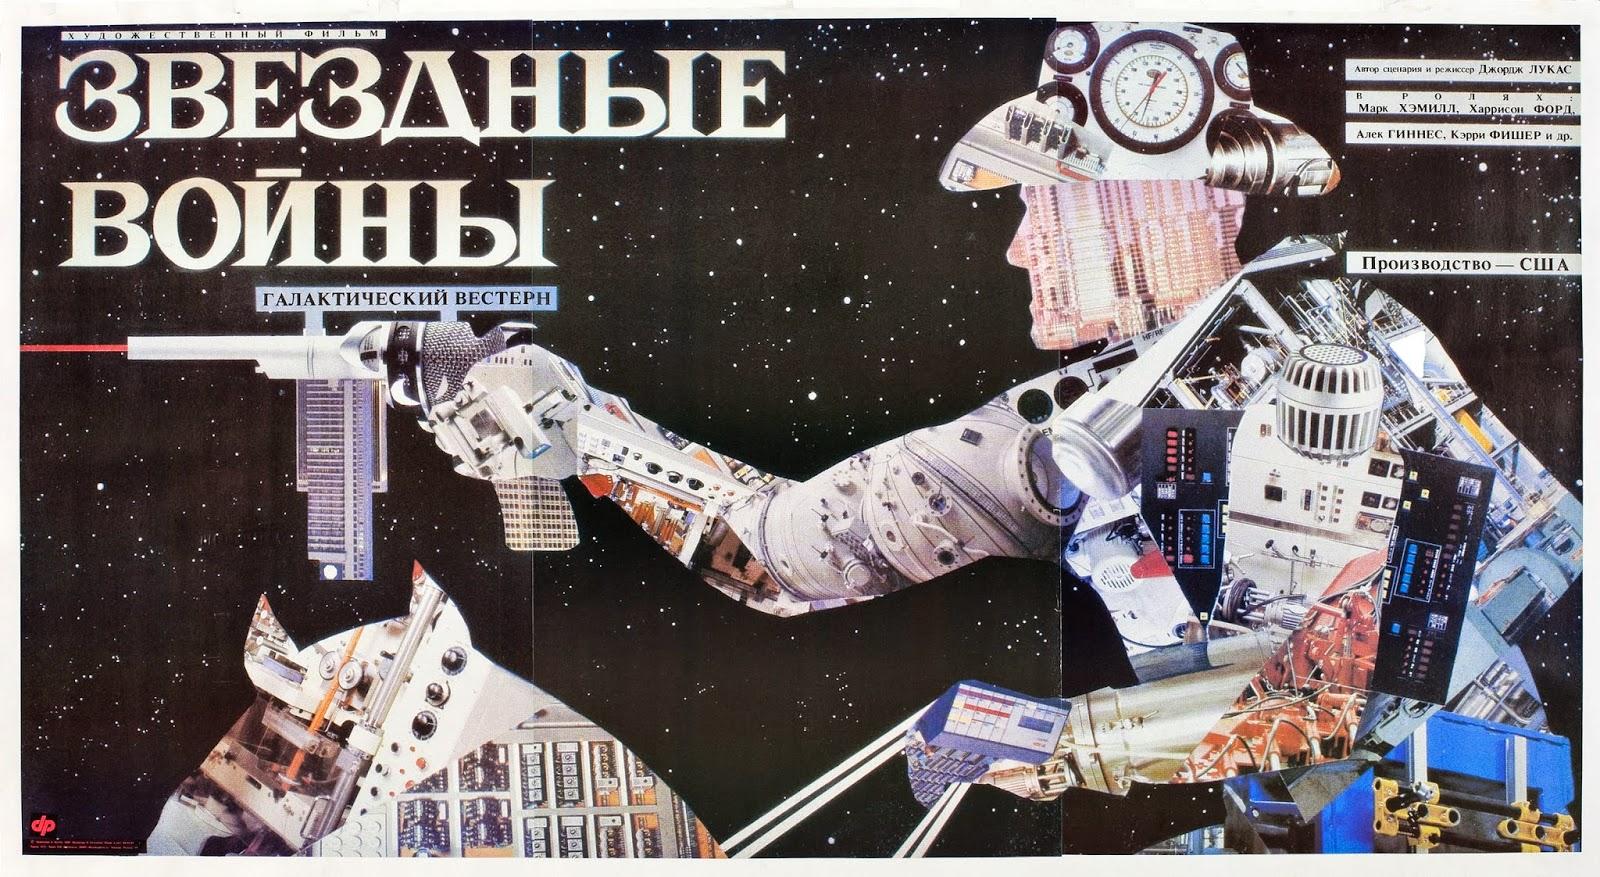 03_star_wars_russian_poster_by_aleksandr_kulov.jpeg